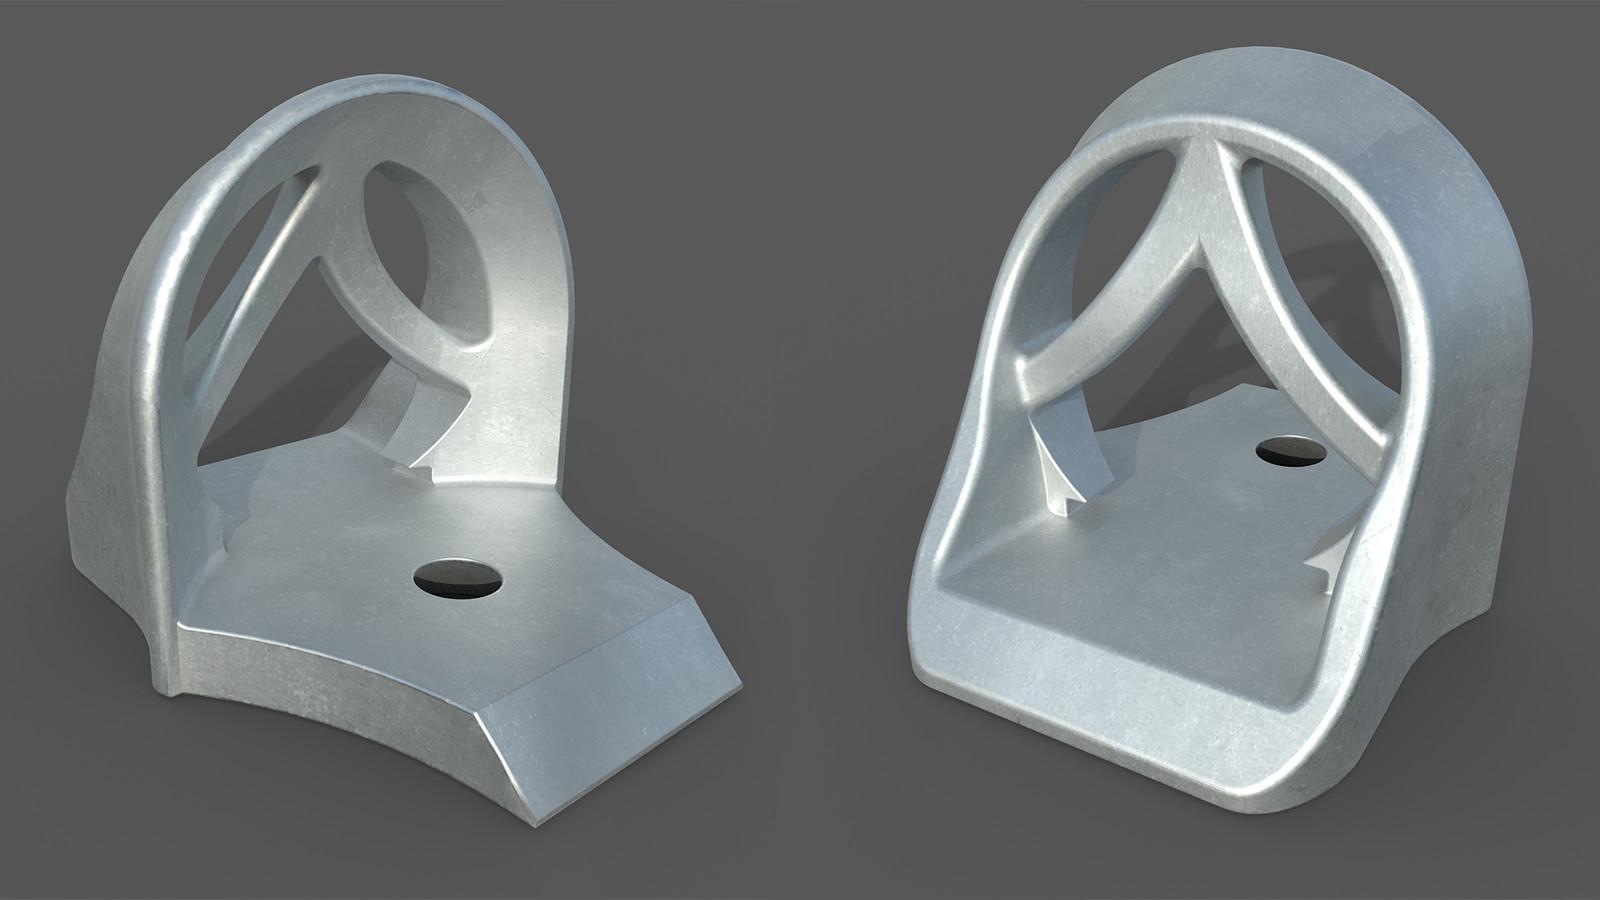 3D renders to visualize the die cast aluminum part.